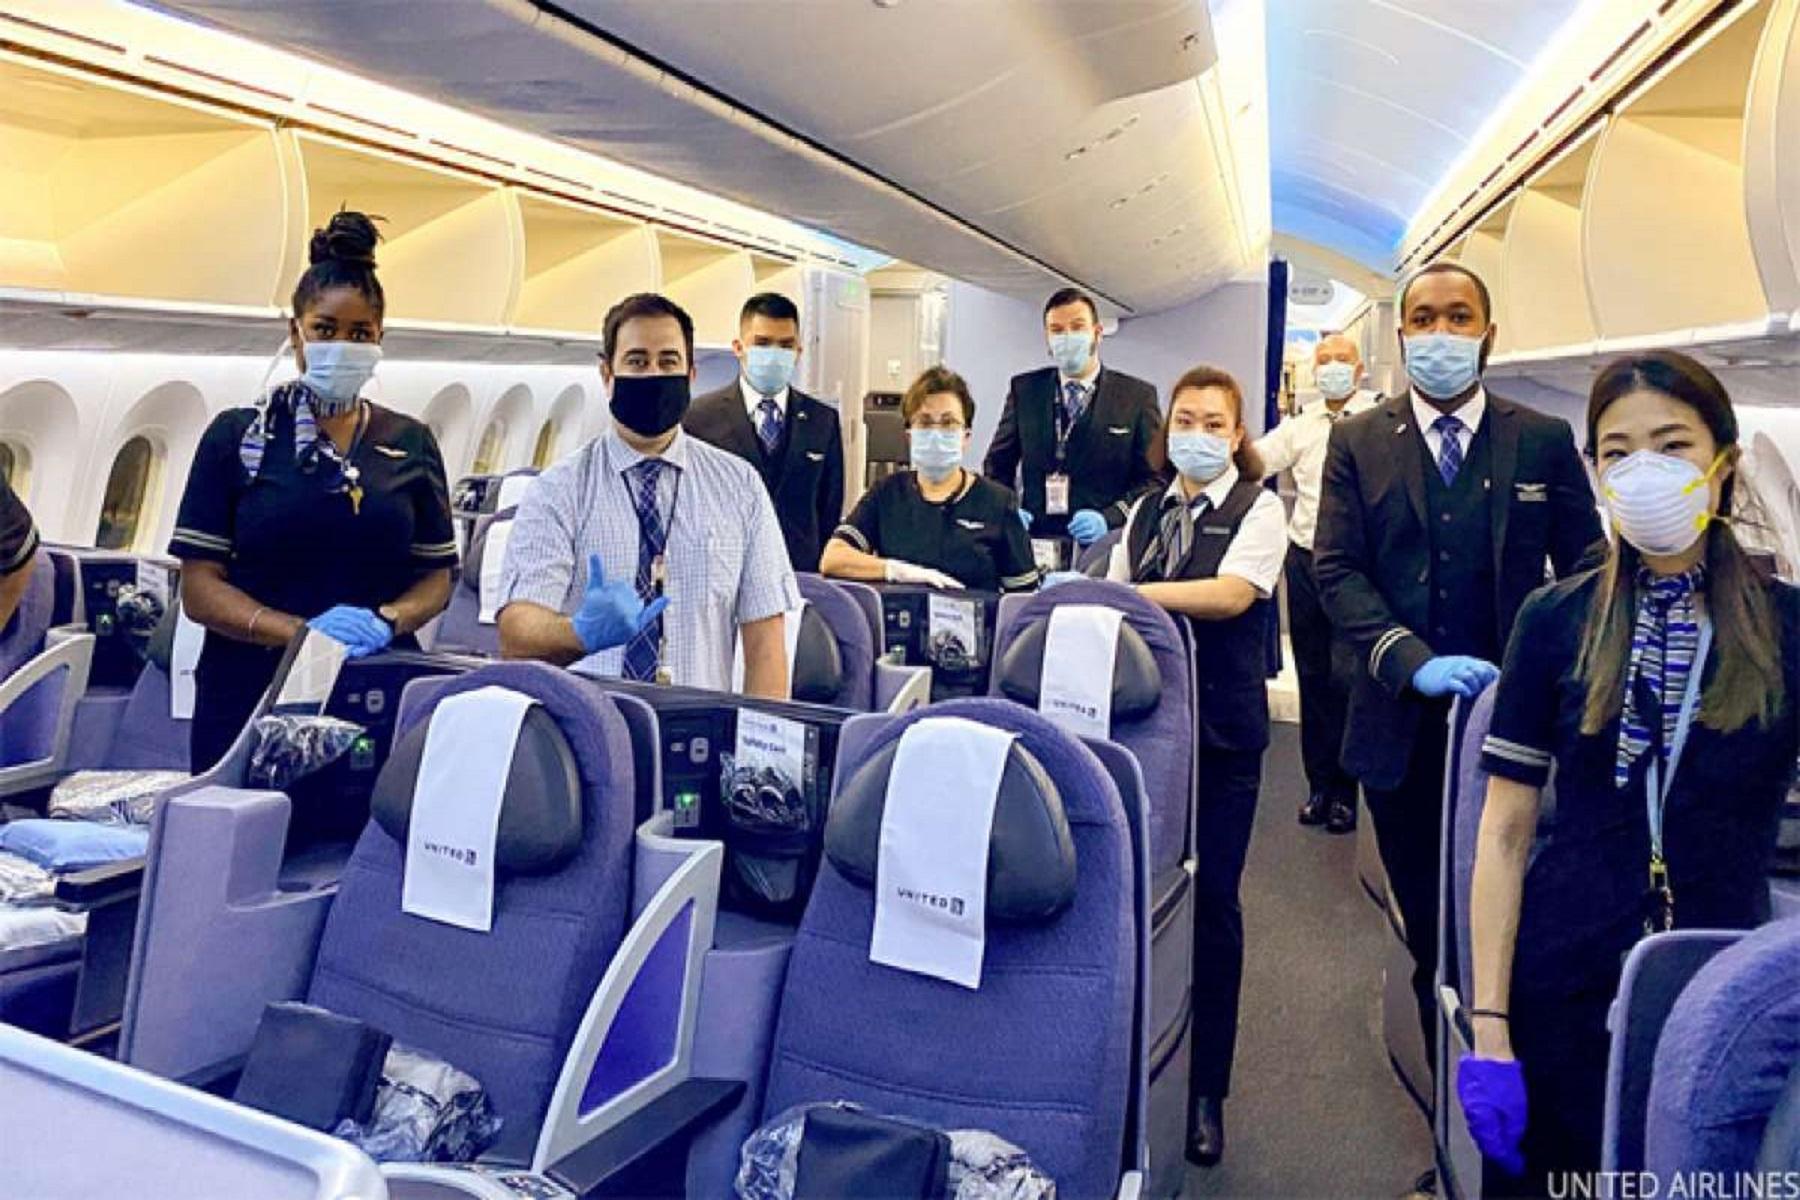 Delta Airlines: Θέλει τις αεροπορικές εταιρείες να μοιραστούν λίστες απαγορευμένων επιβατών.